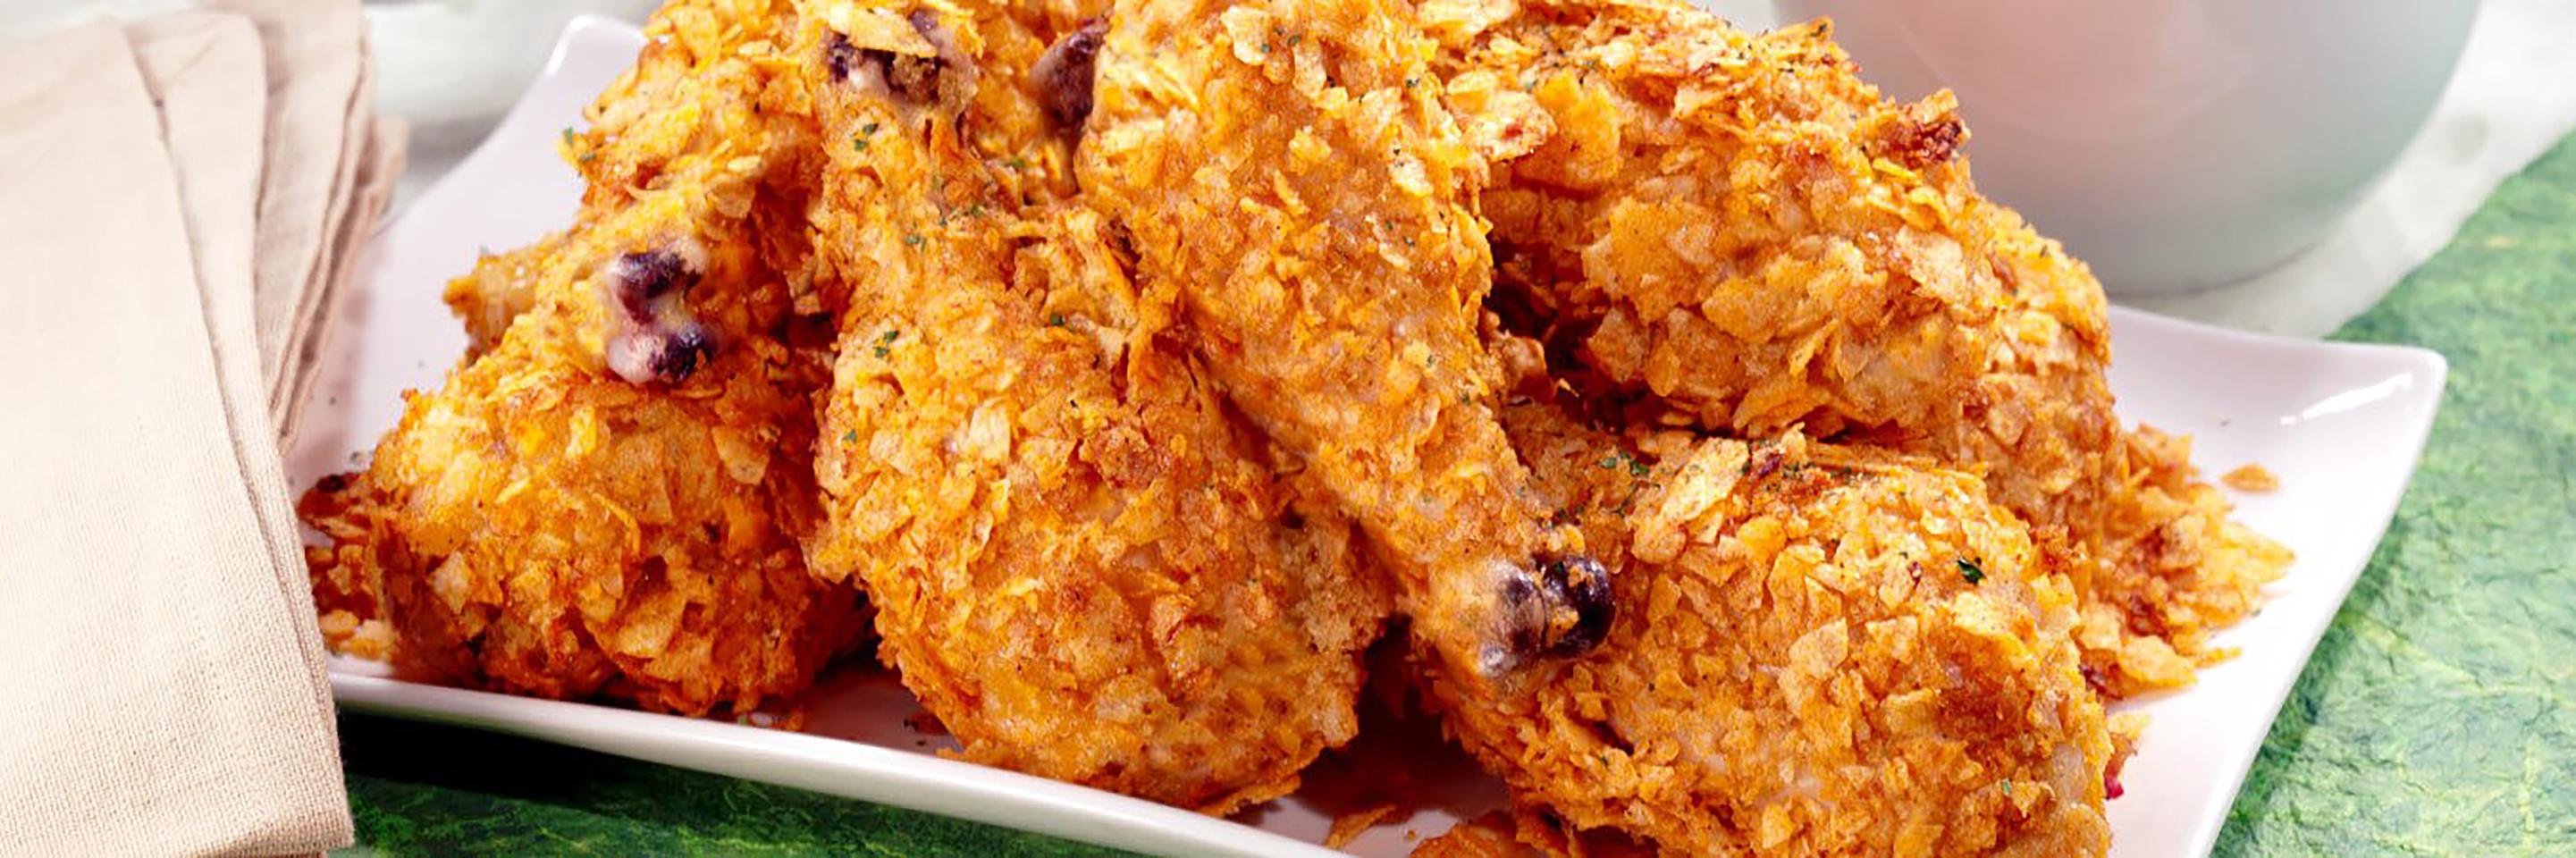 Crispy Baked Chicken Drumsticks